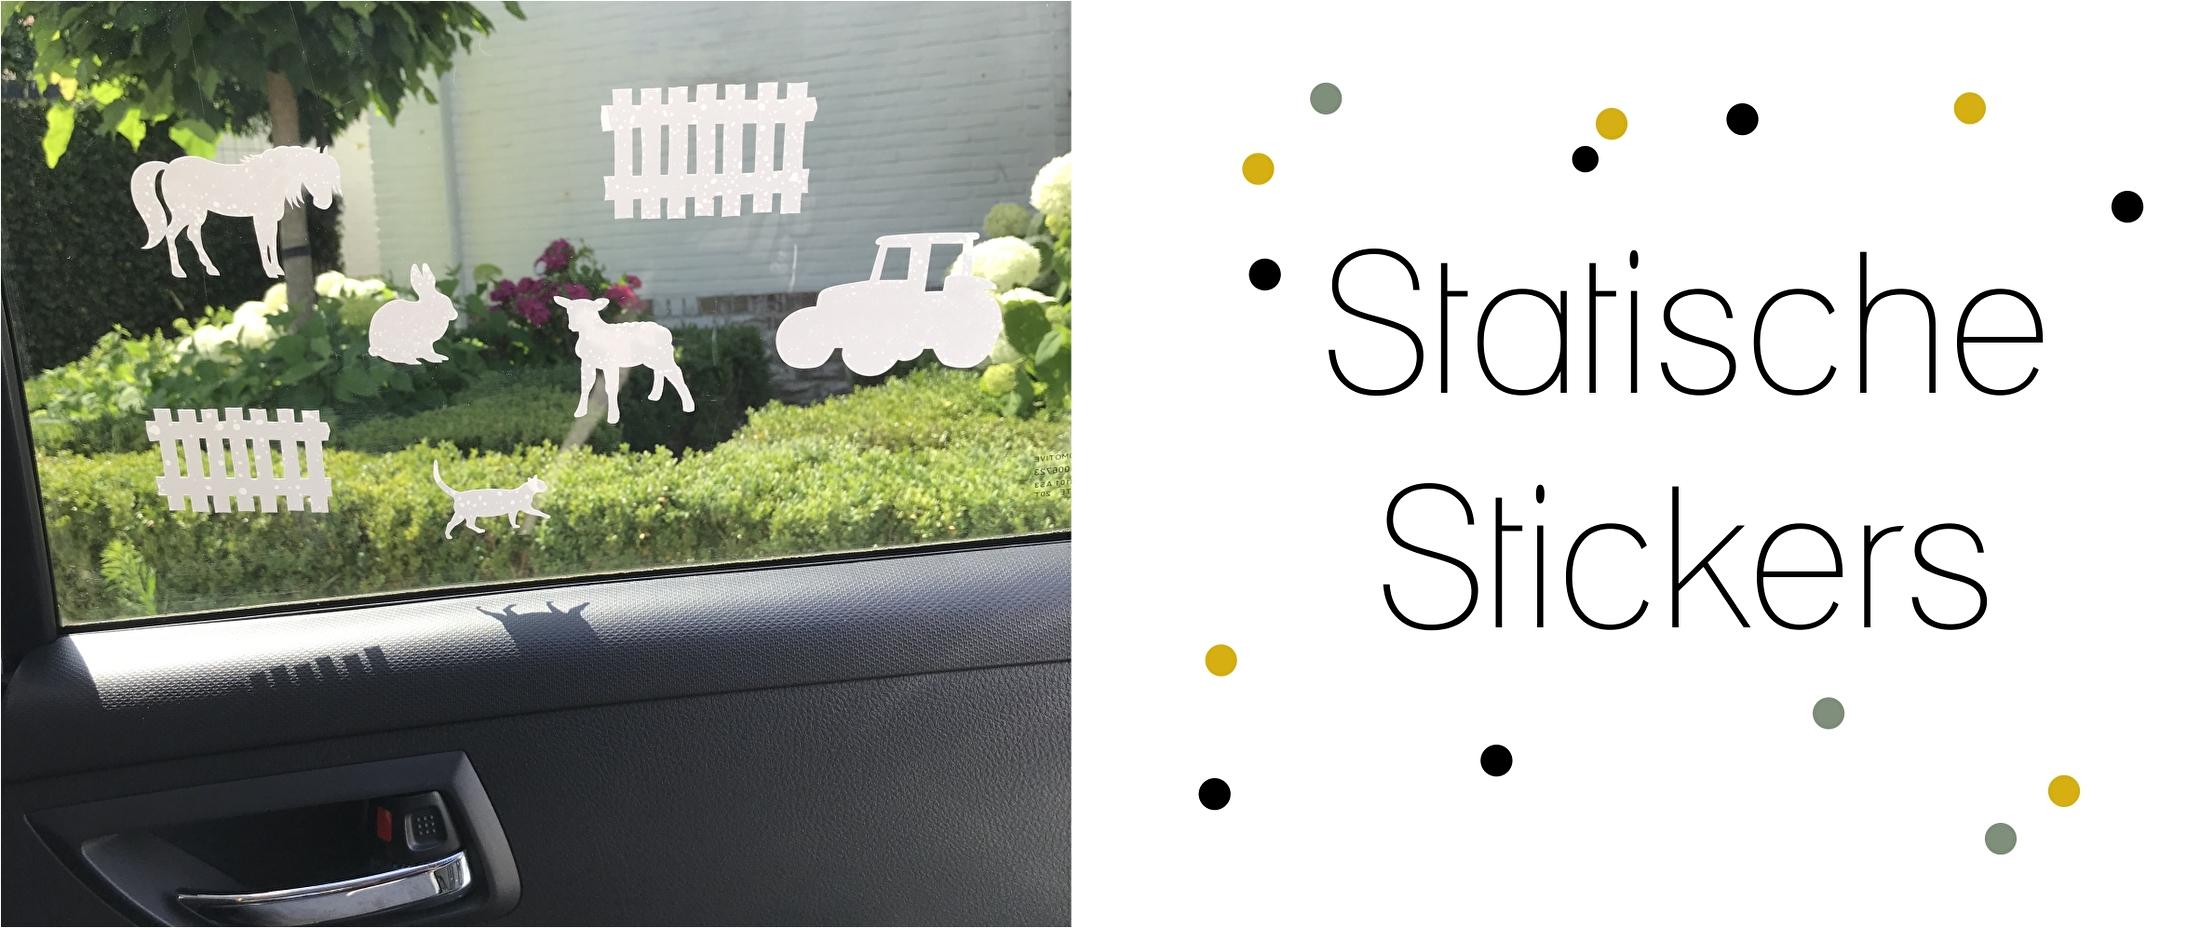 statische stickers autostickers